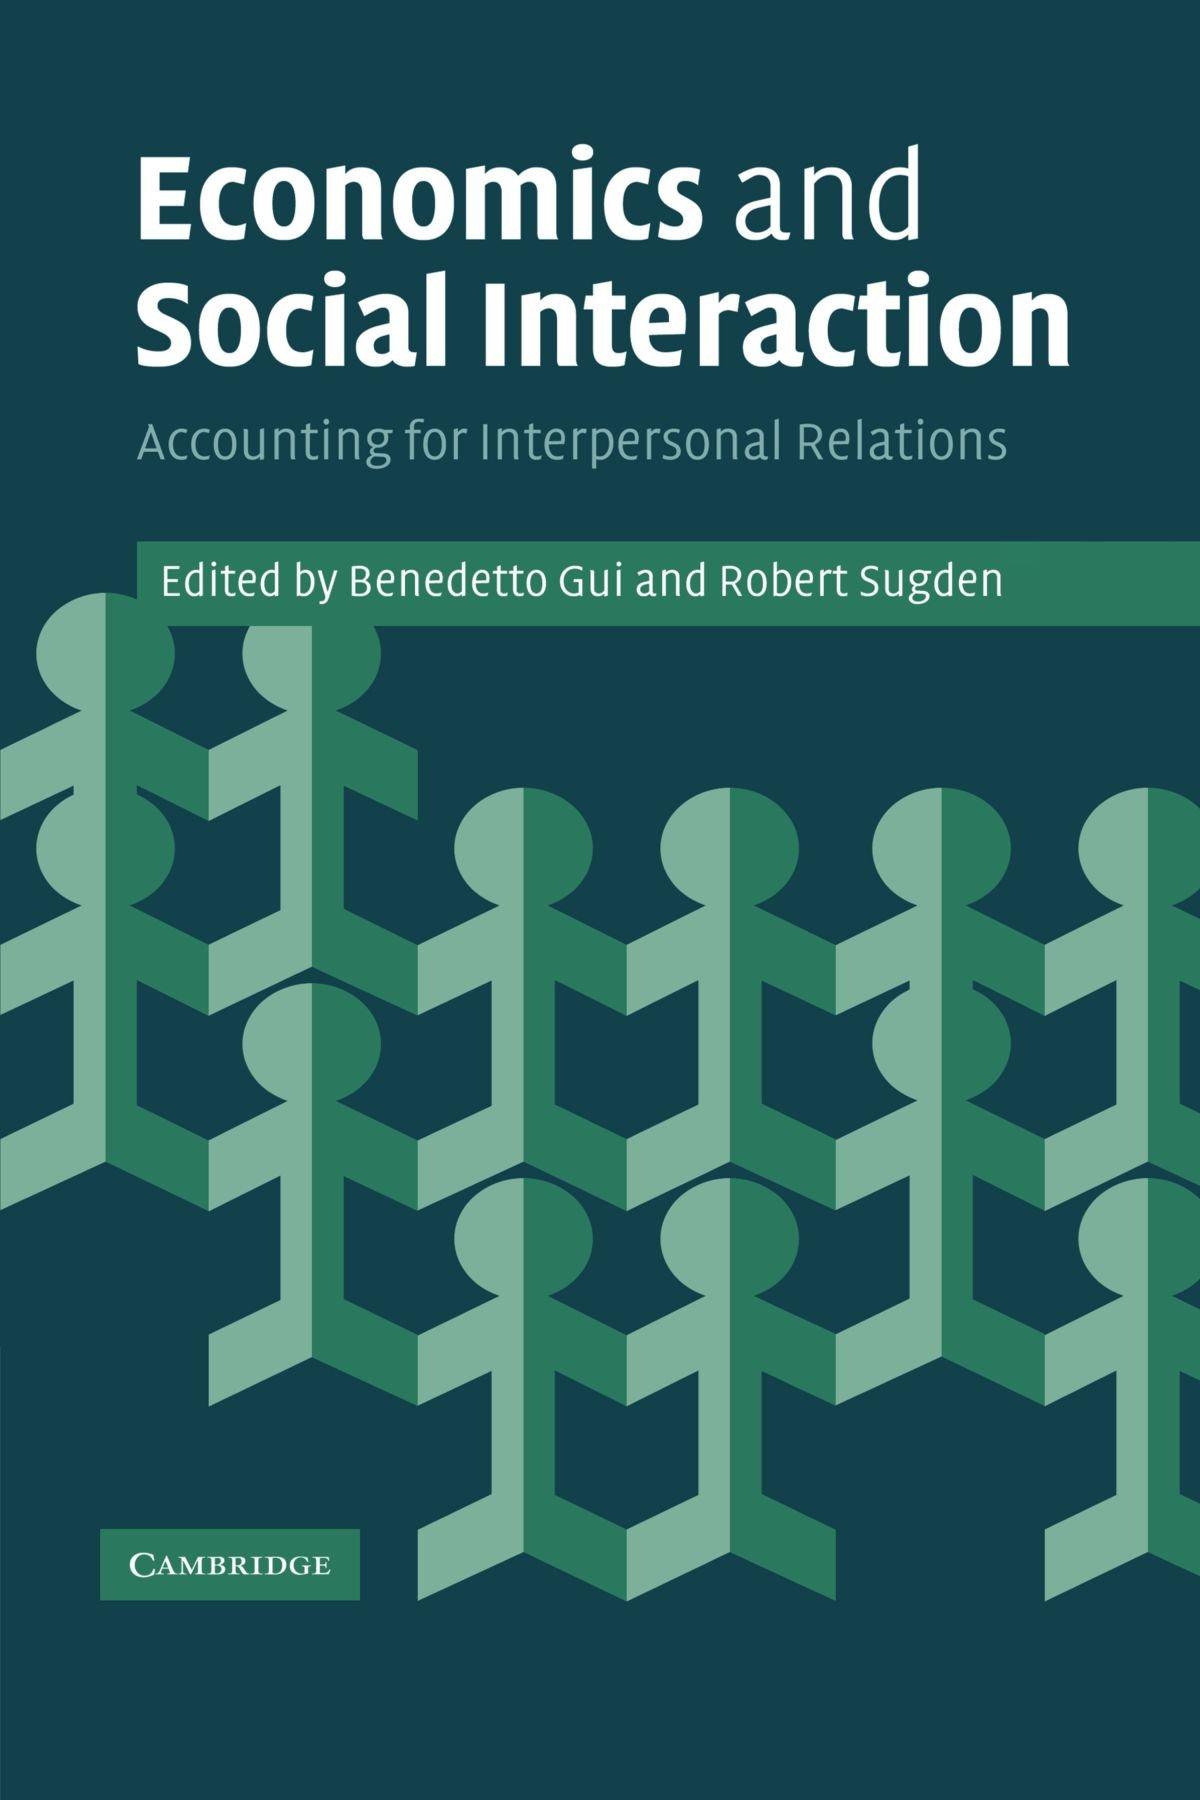 Rivista di etica e scienze sociali / Journal of Ethics & Social Sciences